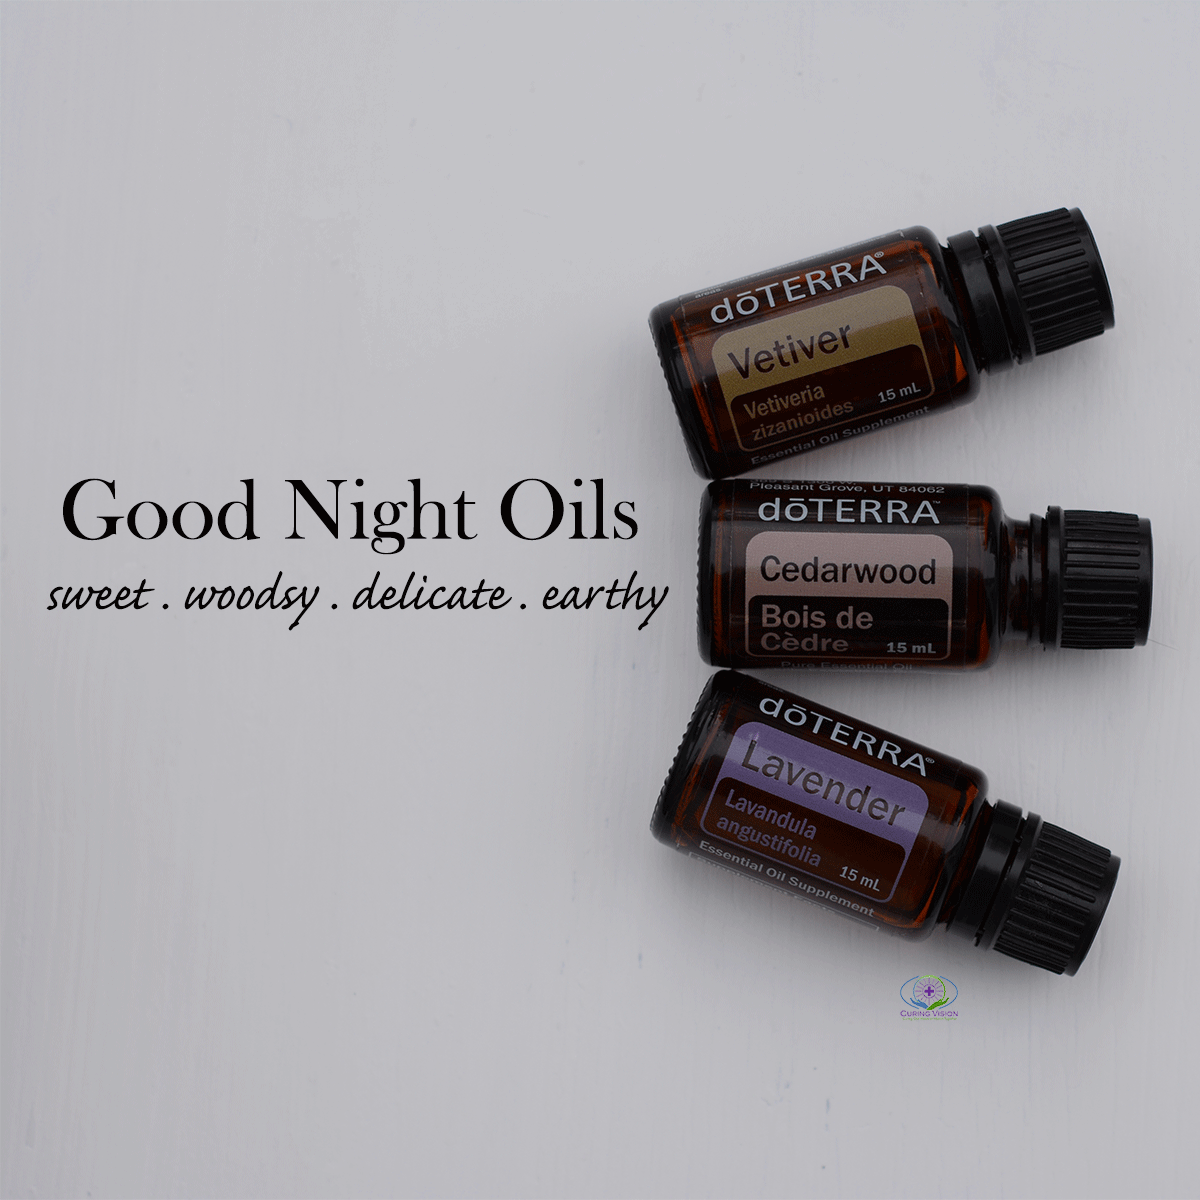 Good Night Oils Cedarwood Vetiver Lavender Curing Vision